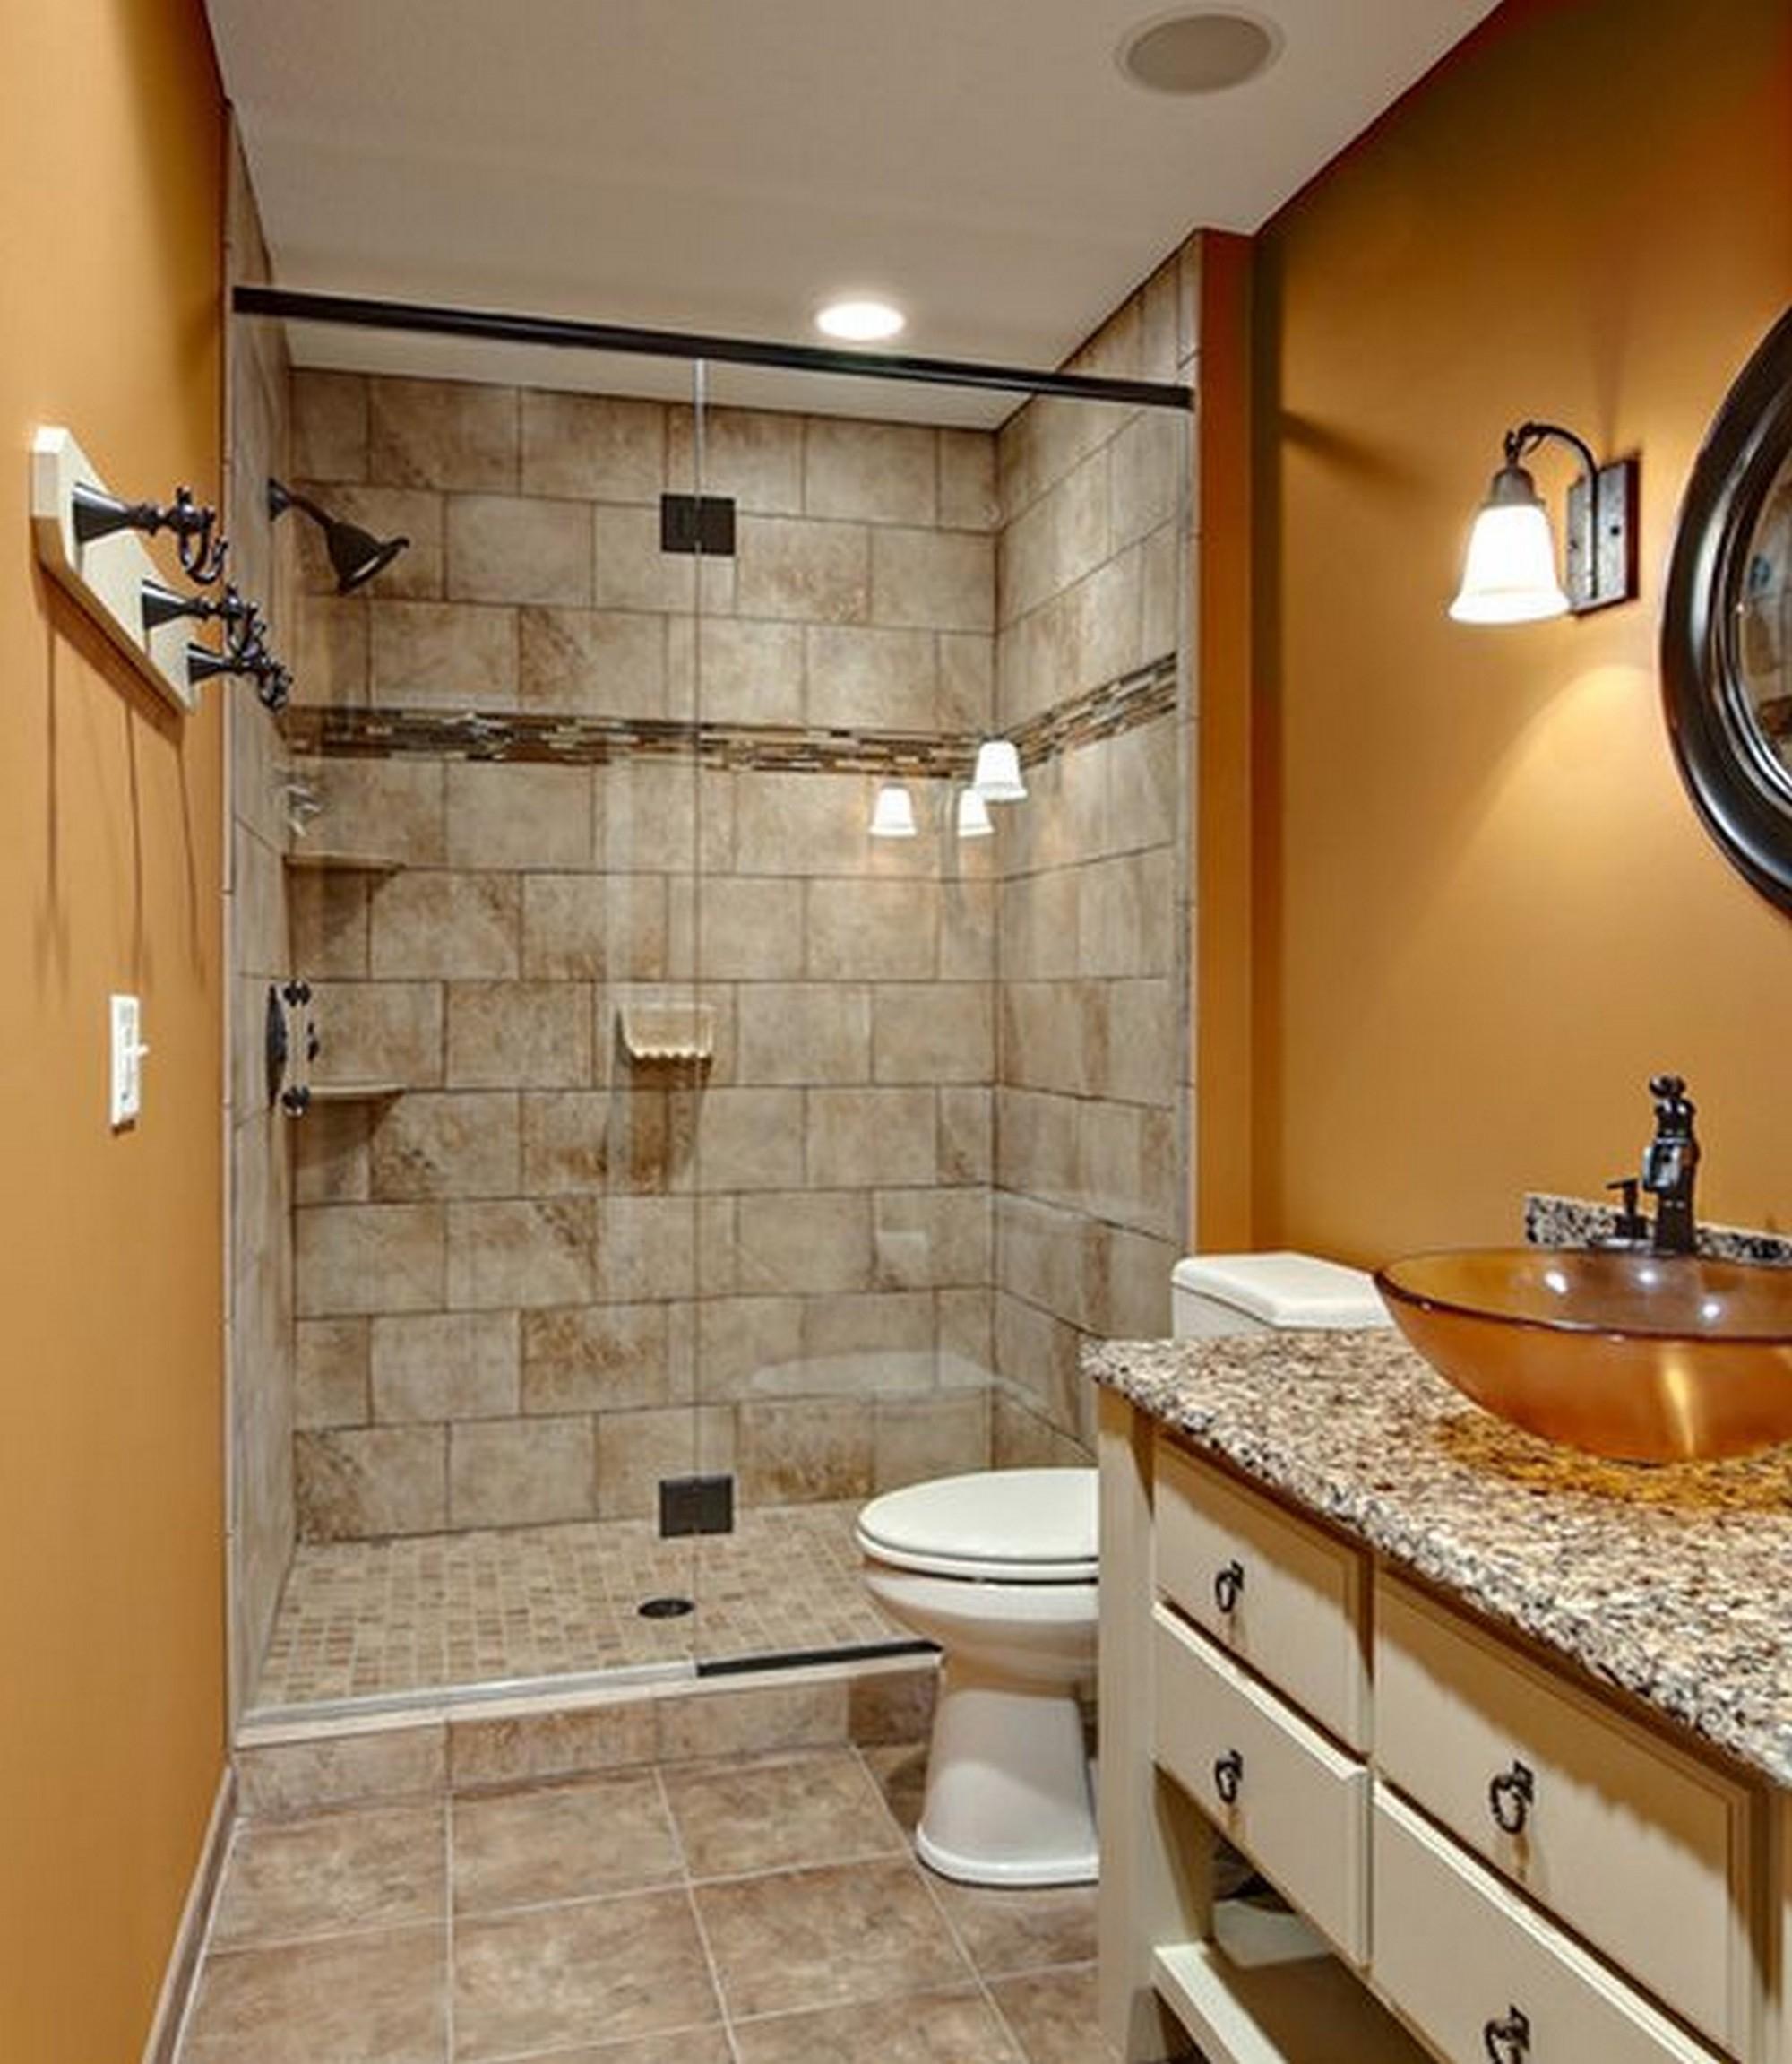 Bathroom renovation idea